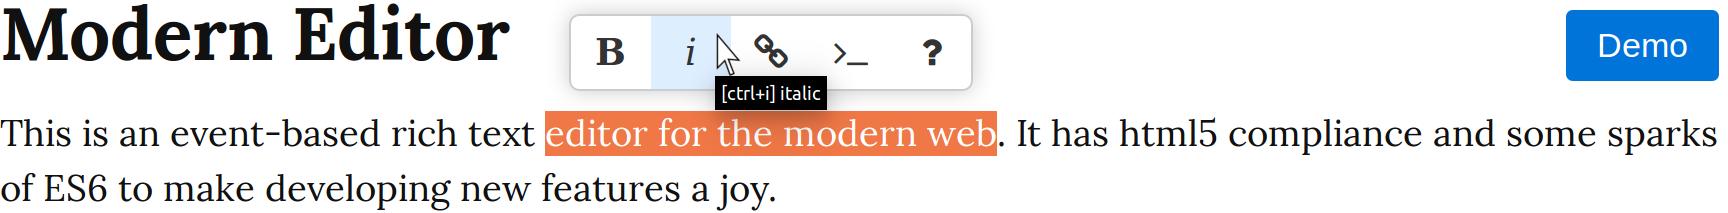 Modern Editor